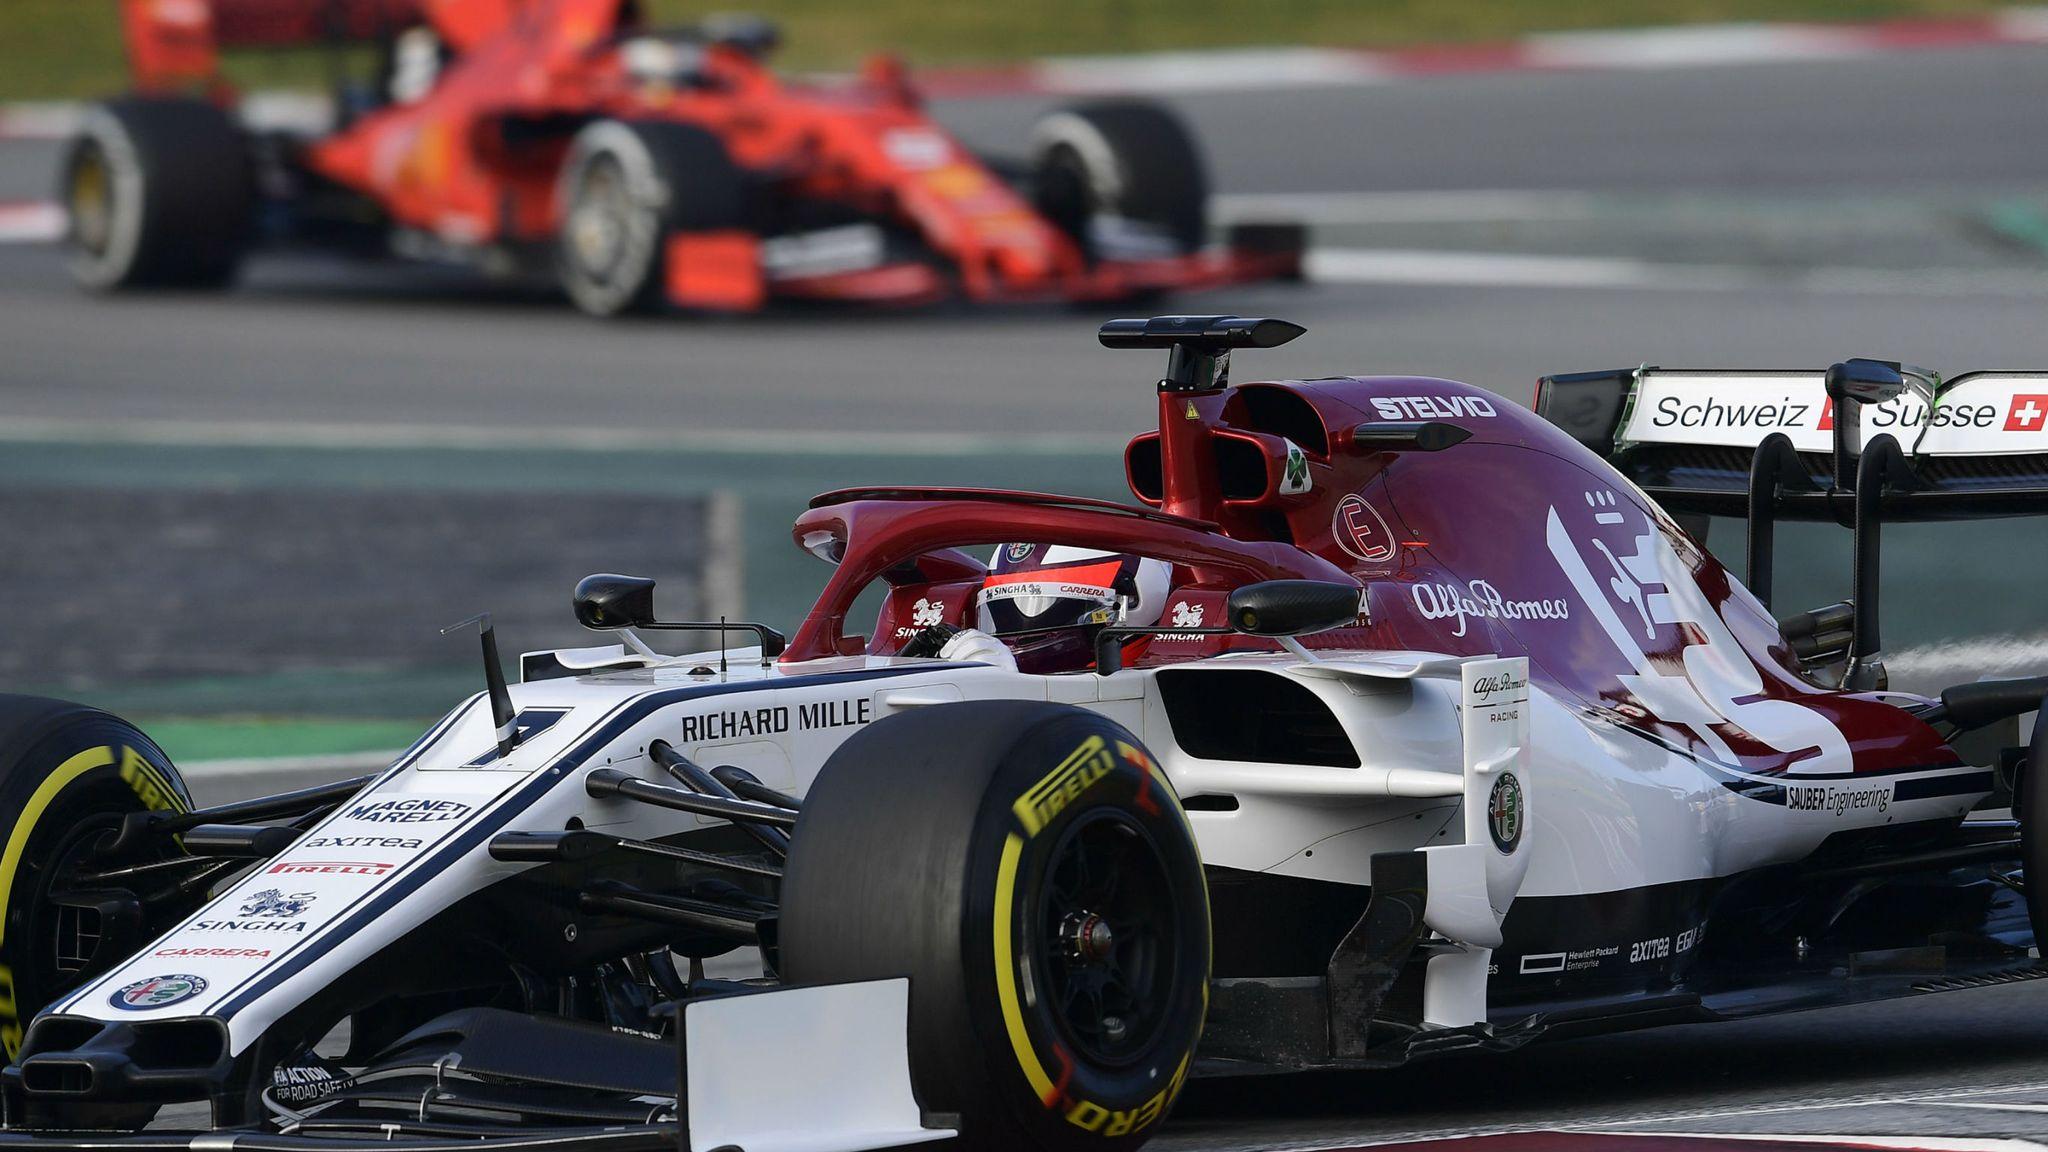 F1 2019: Introducing the new Formula 1 cars | F1 News